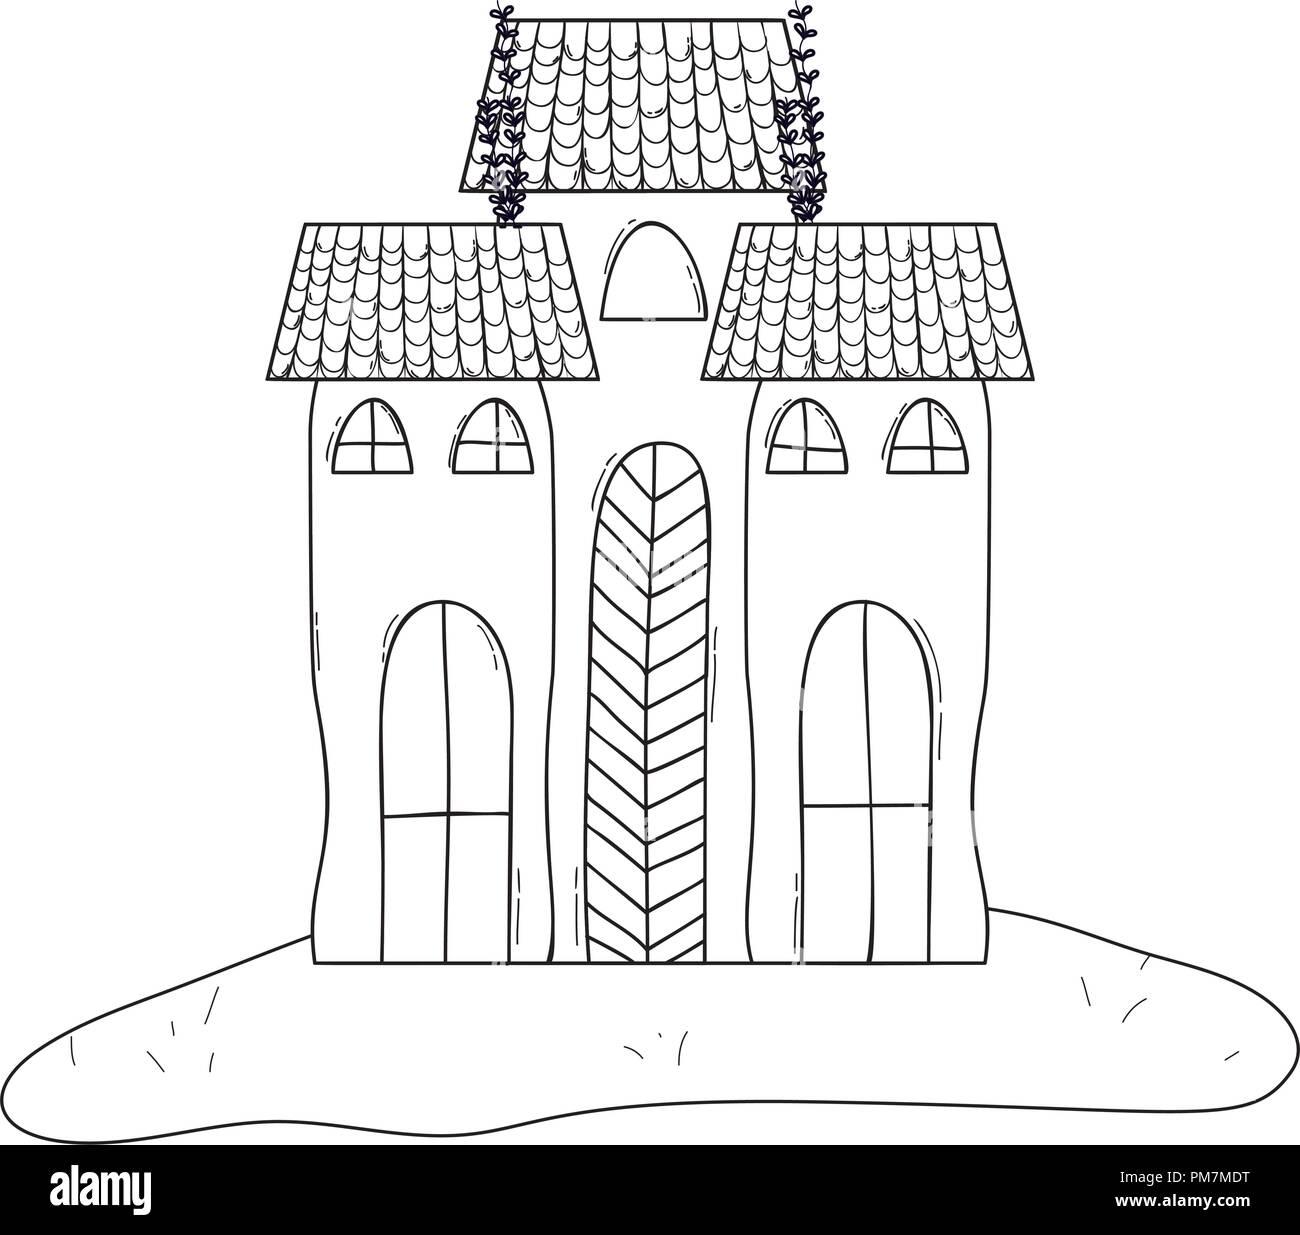 Outline Horror Castle Building Architecture Style